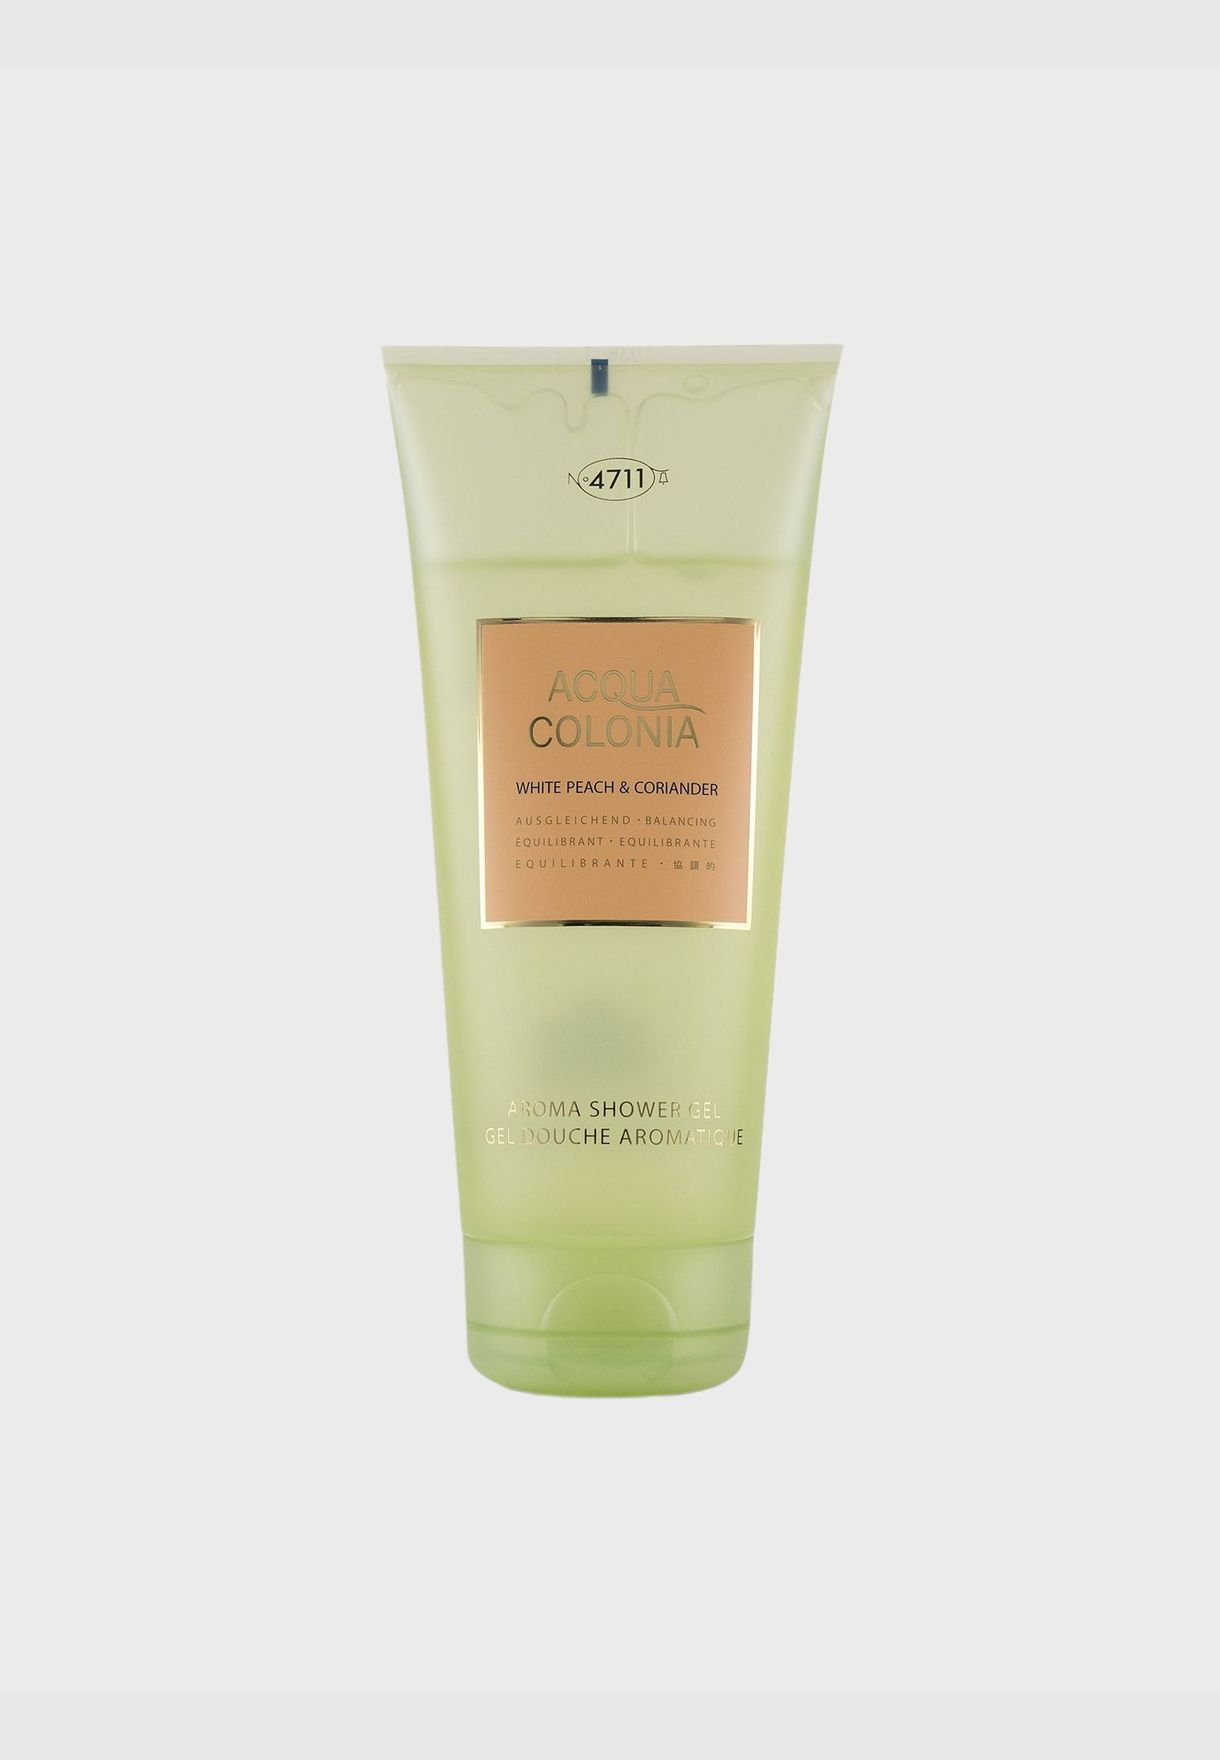 Acqua Colonia White Peach & Coriander Aroma Shower Gel